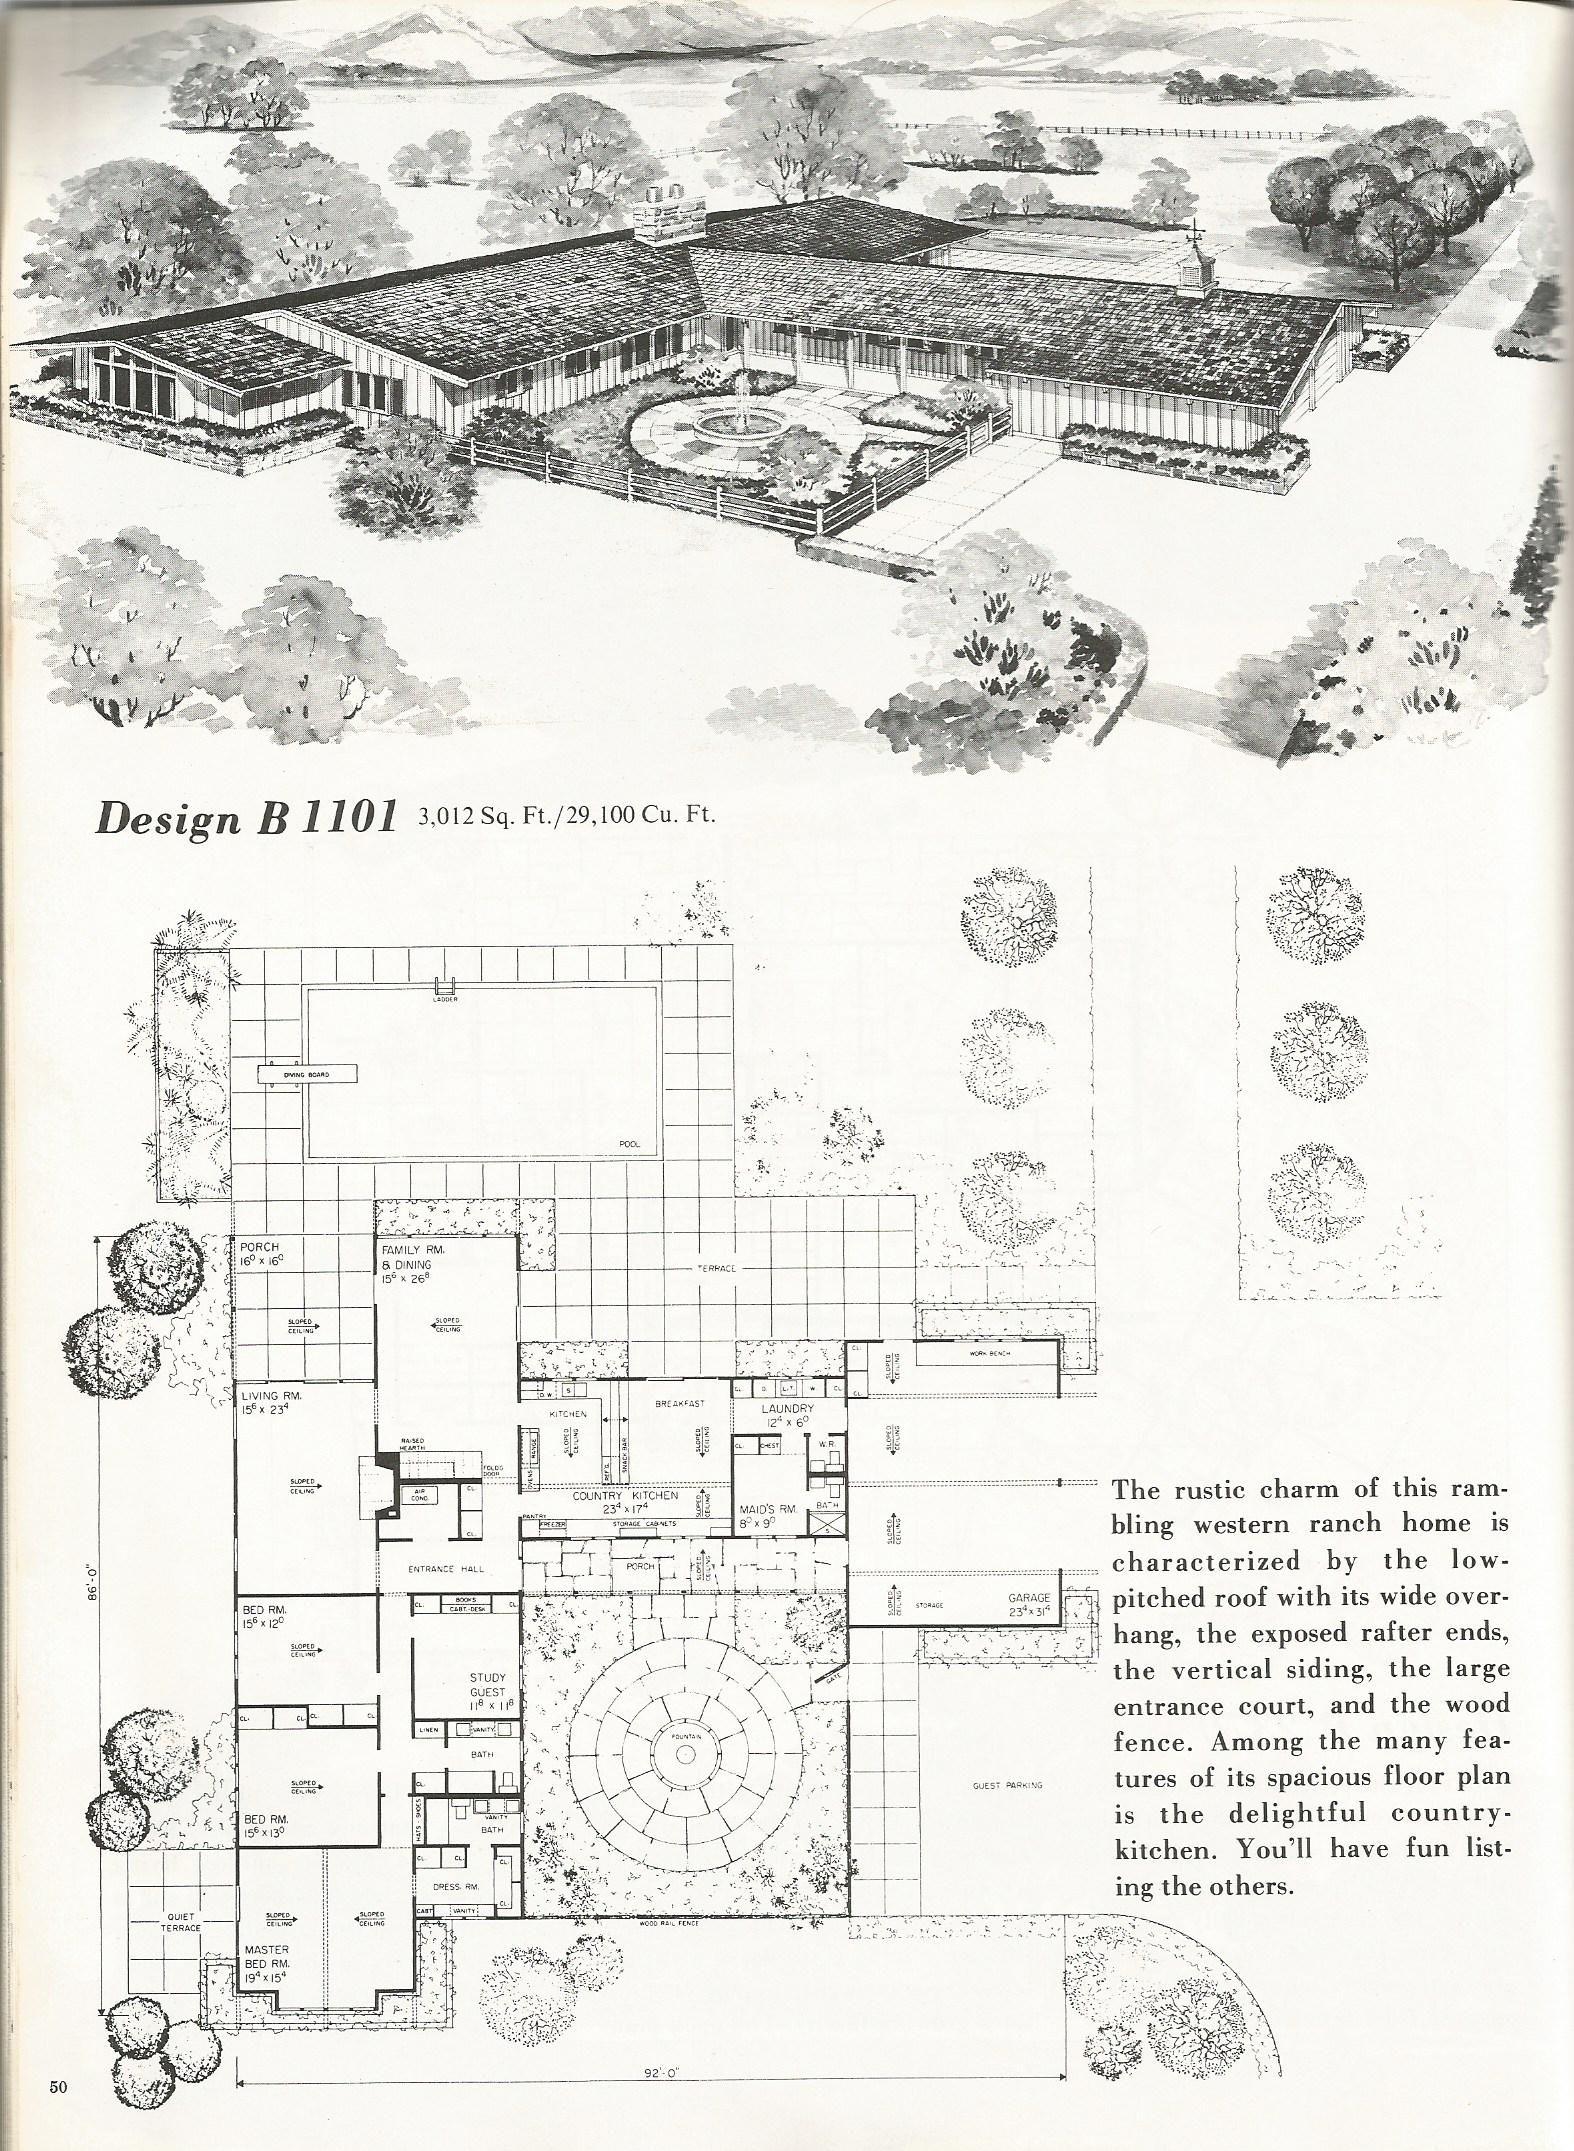 vintage house plans, western ranch houses | Home Designs | Pinterest ...